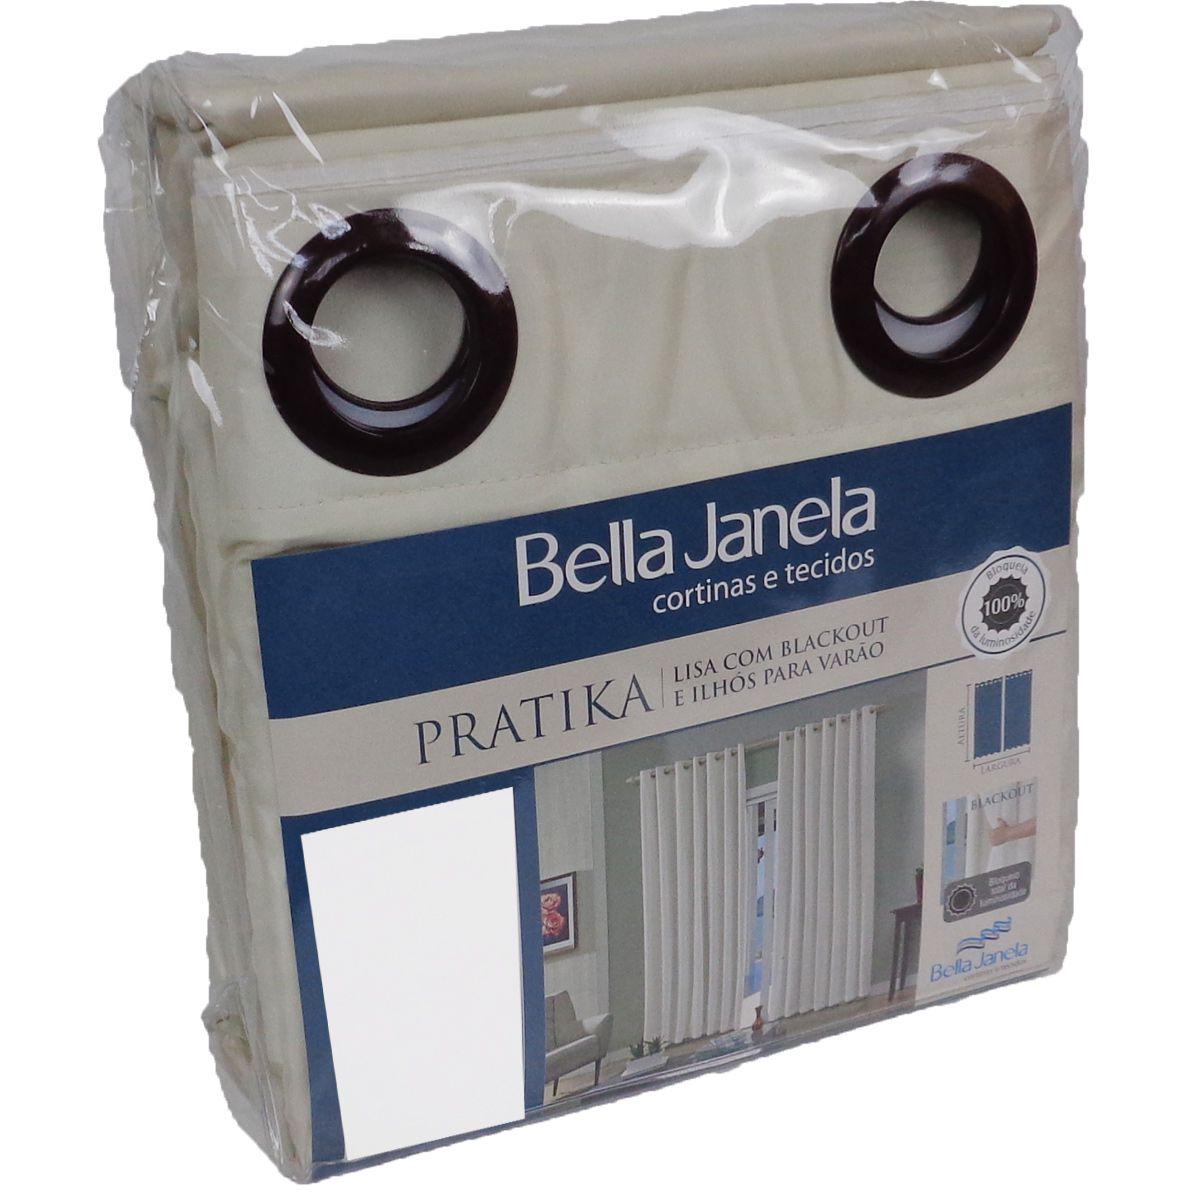 Cortina Blackout Areia Pratika Lisa Slim 2,60 X 1,70 Bella Janela